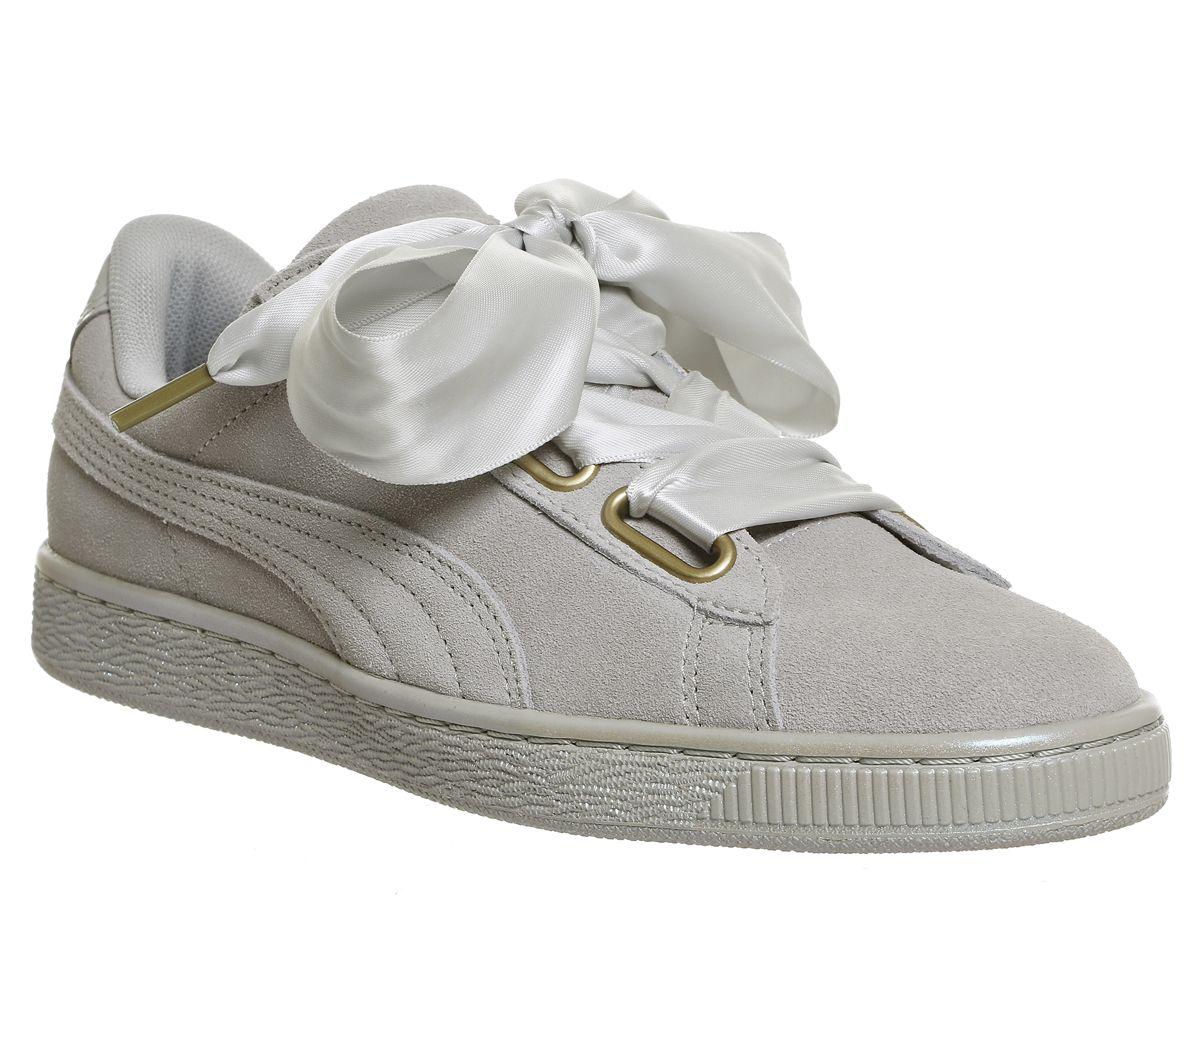 7860383430387d SENTINEL Donna Puma Suede cuore grigio viola raso scarpe da ginnastica  scarpe